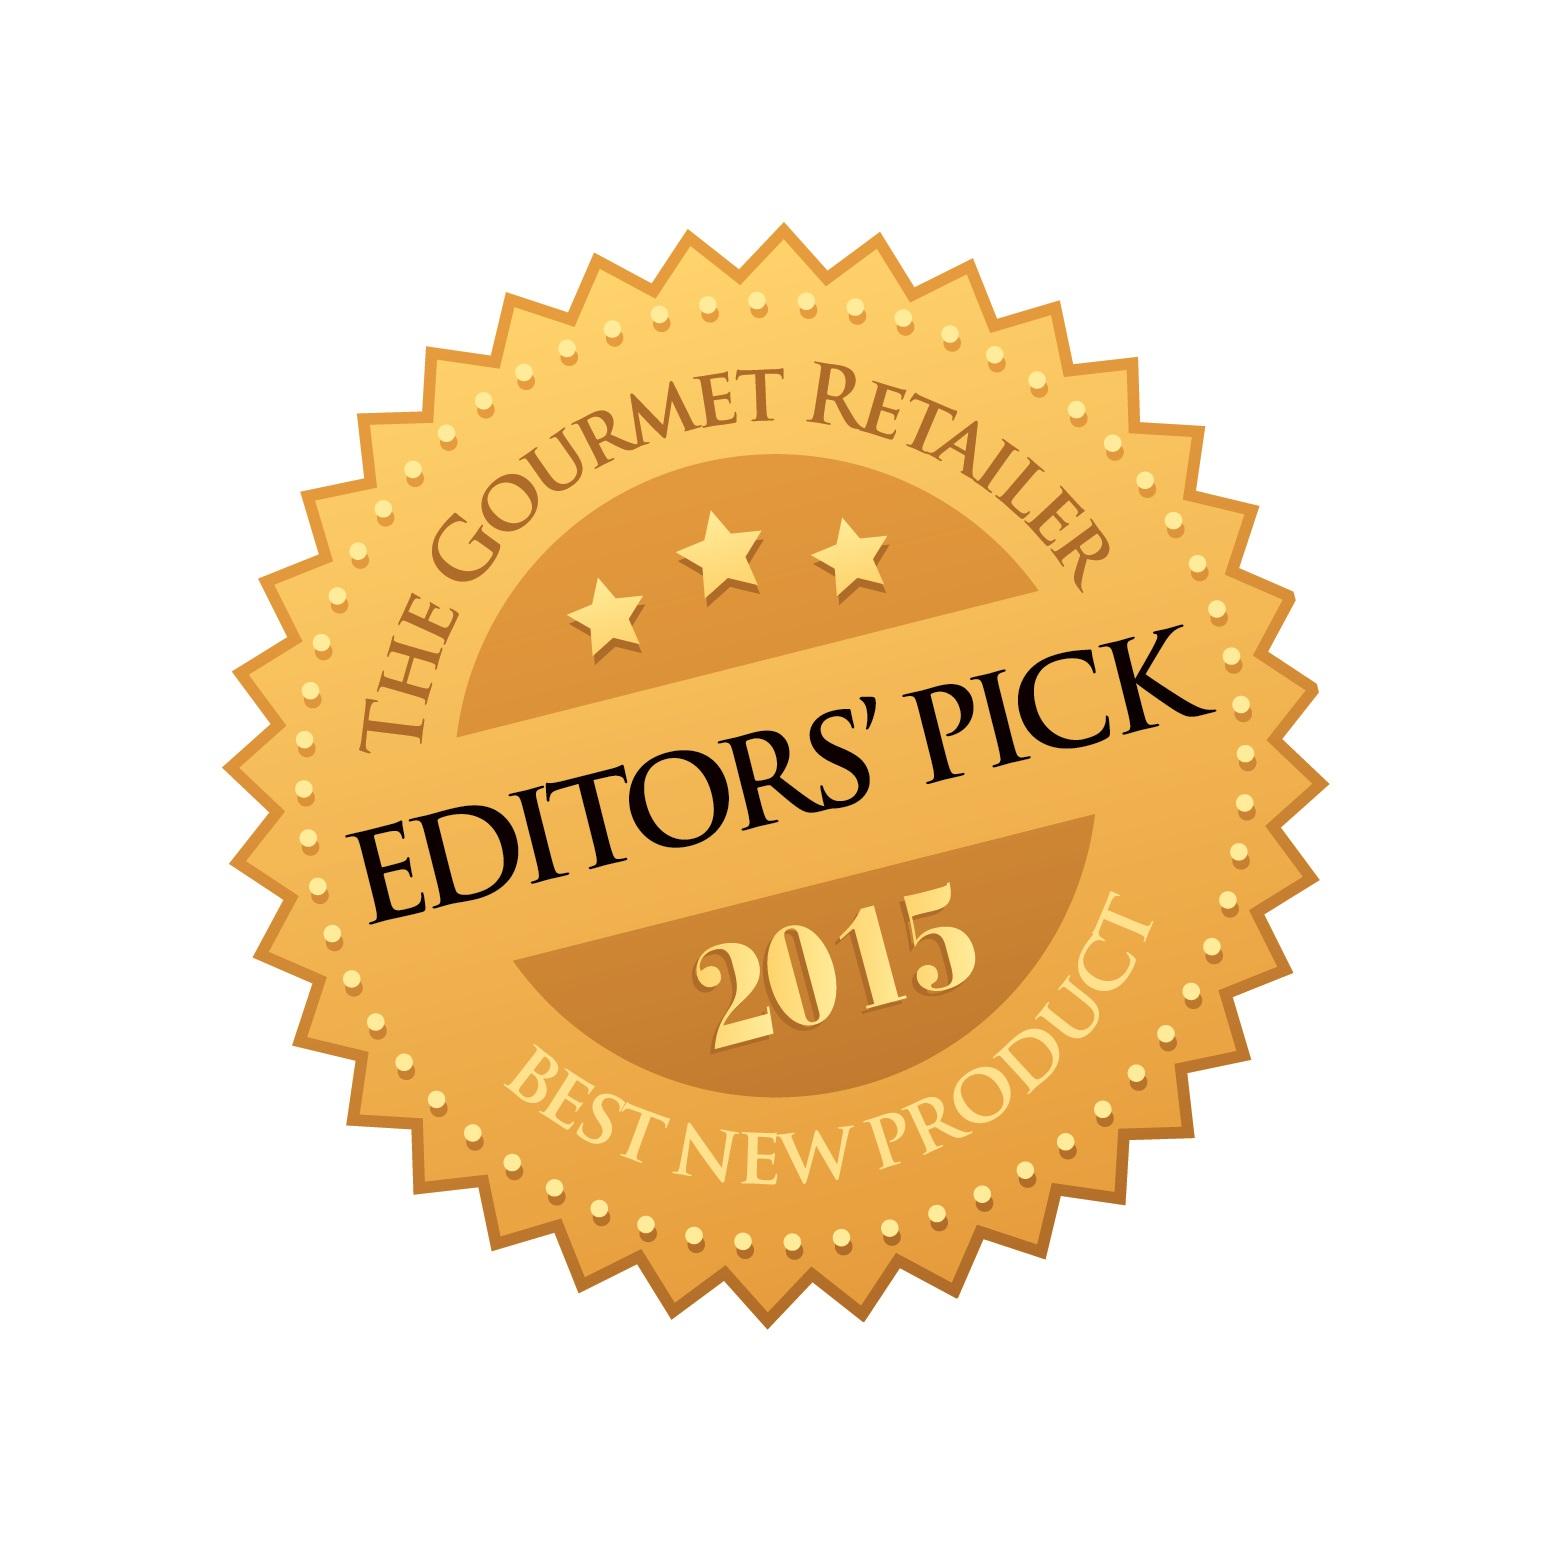 Masala Mama wins The Gourmet Retailer Editors' Pick award